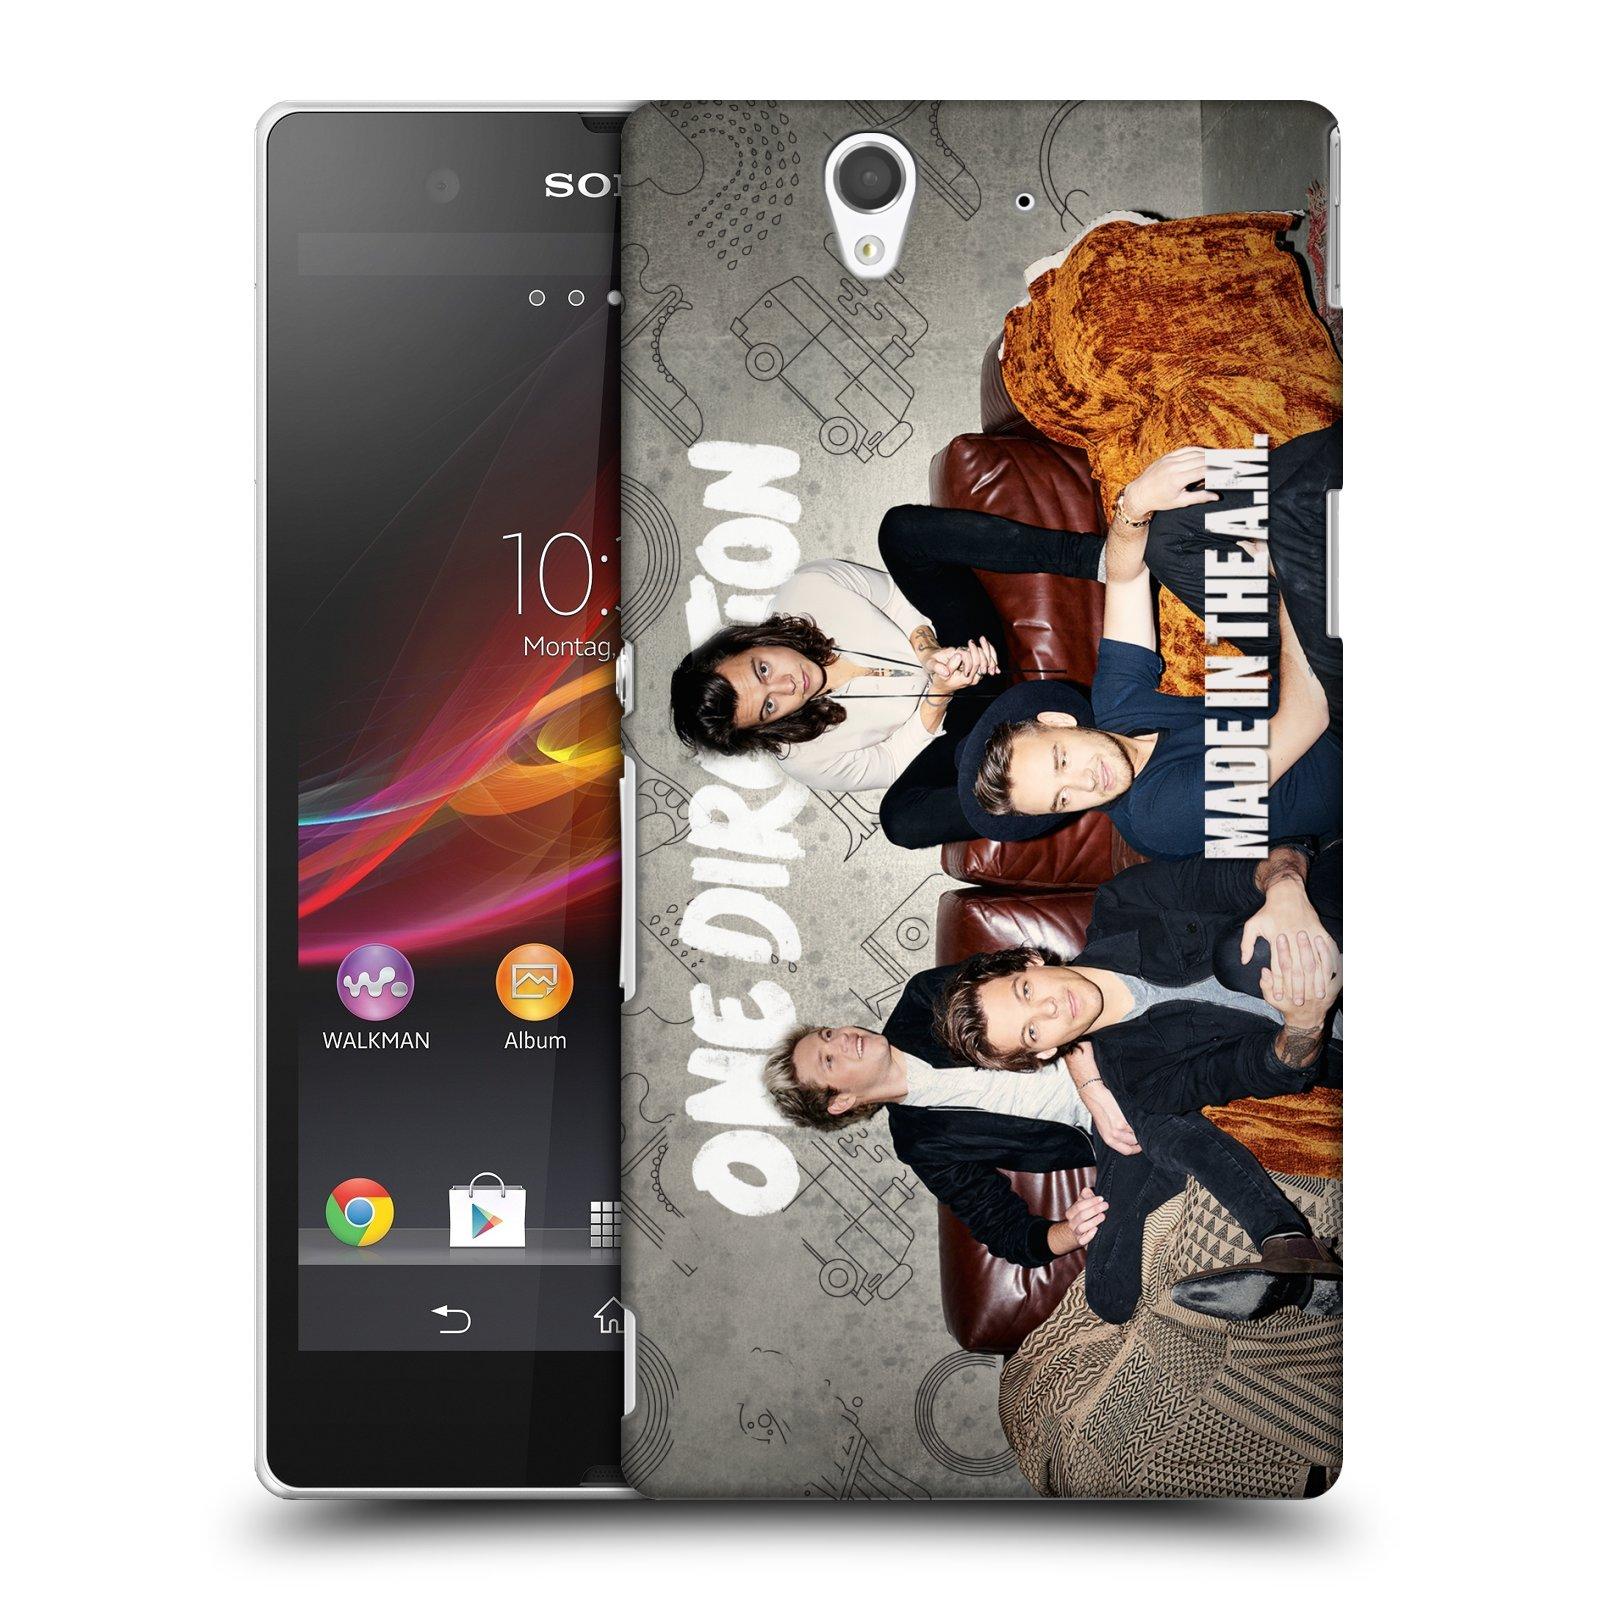 Plastové pouzdro na mobil Sony Xperia Z C6603 HEAD CASE One Direction - Na Gaučíku (Kryt či obal One Direction Official na mobilní telefon Sony Xperia Z)